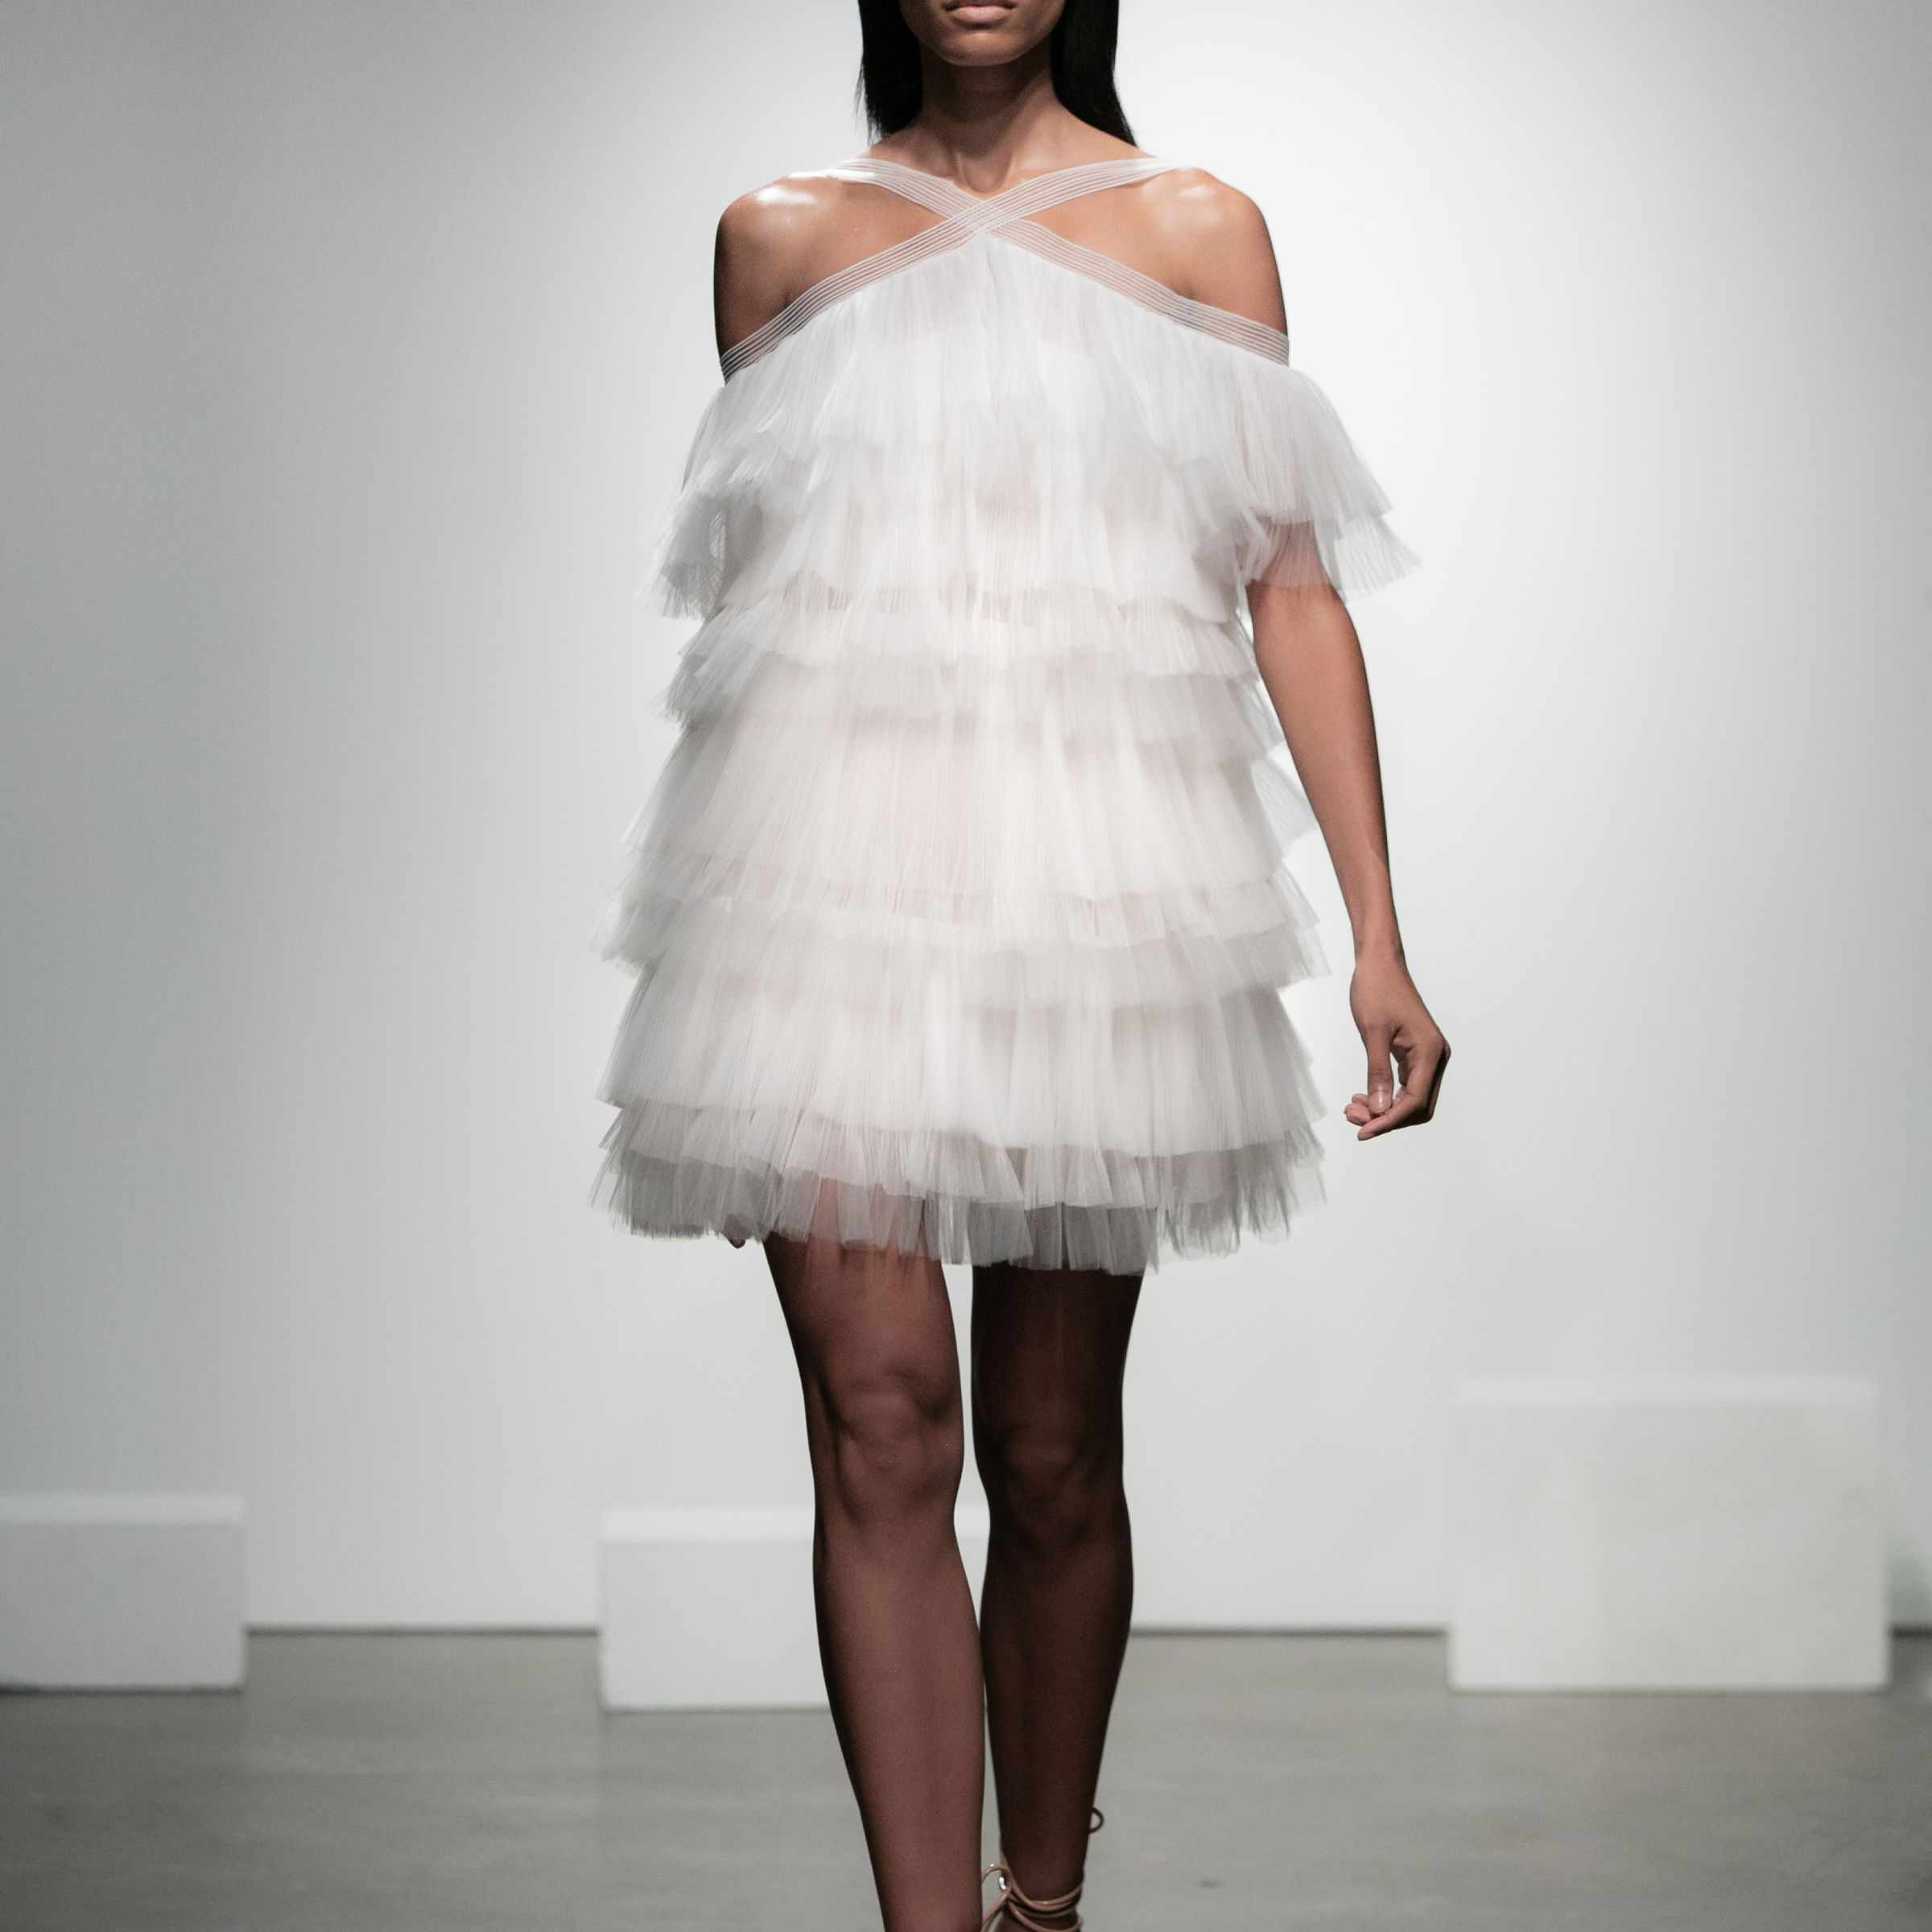 Model in layered tulle mini dress